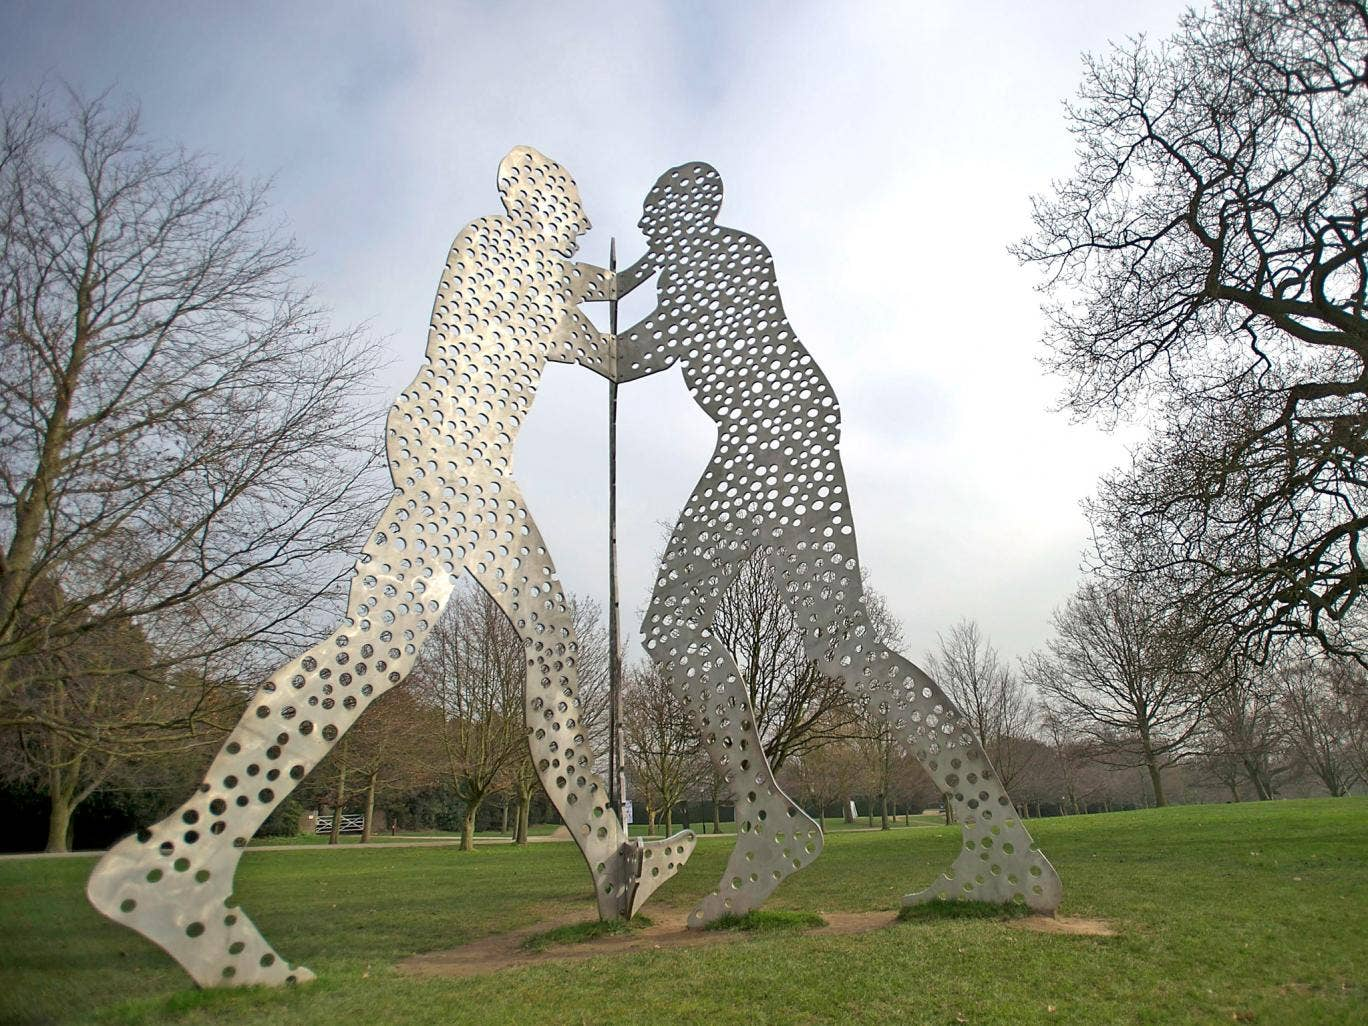 'Molecular Man +1+1+1' by Jonathan Borofsky at Yorkshire Sculpture park